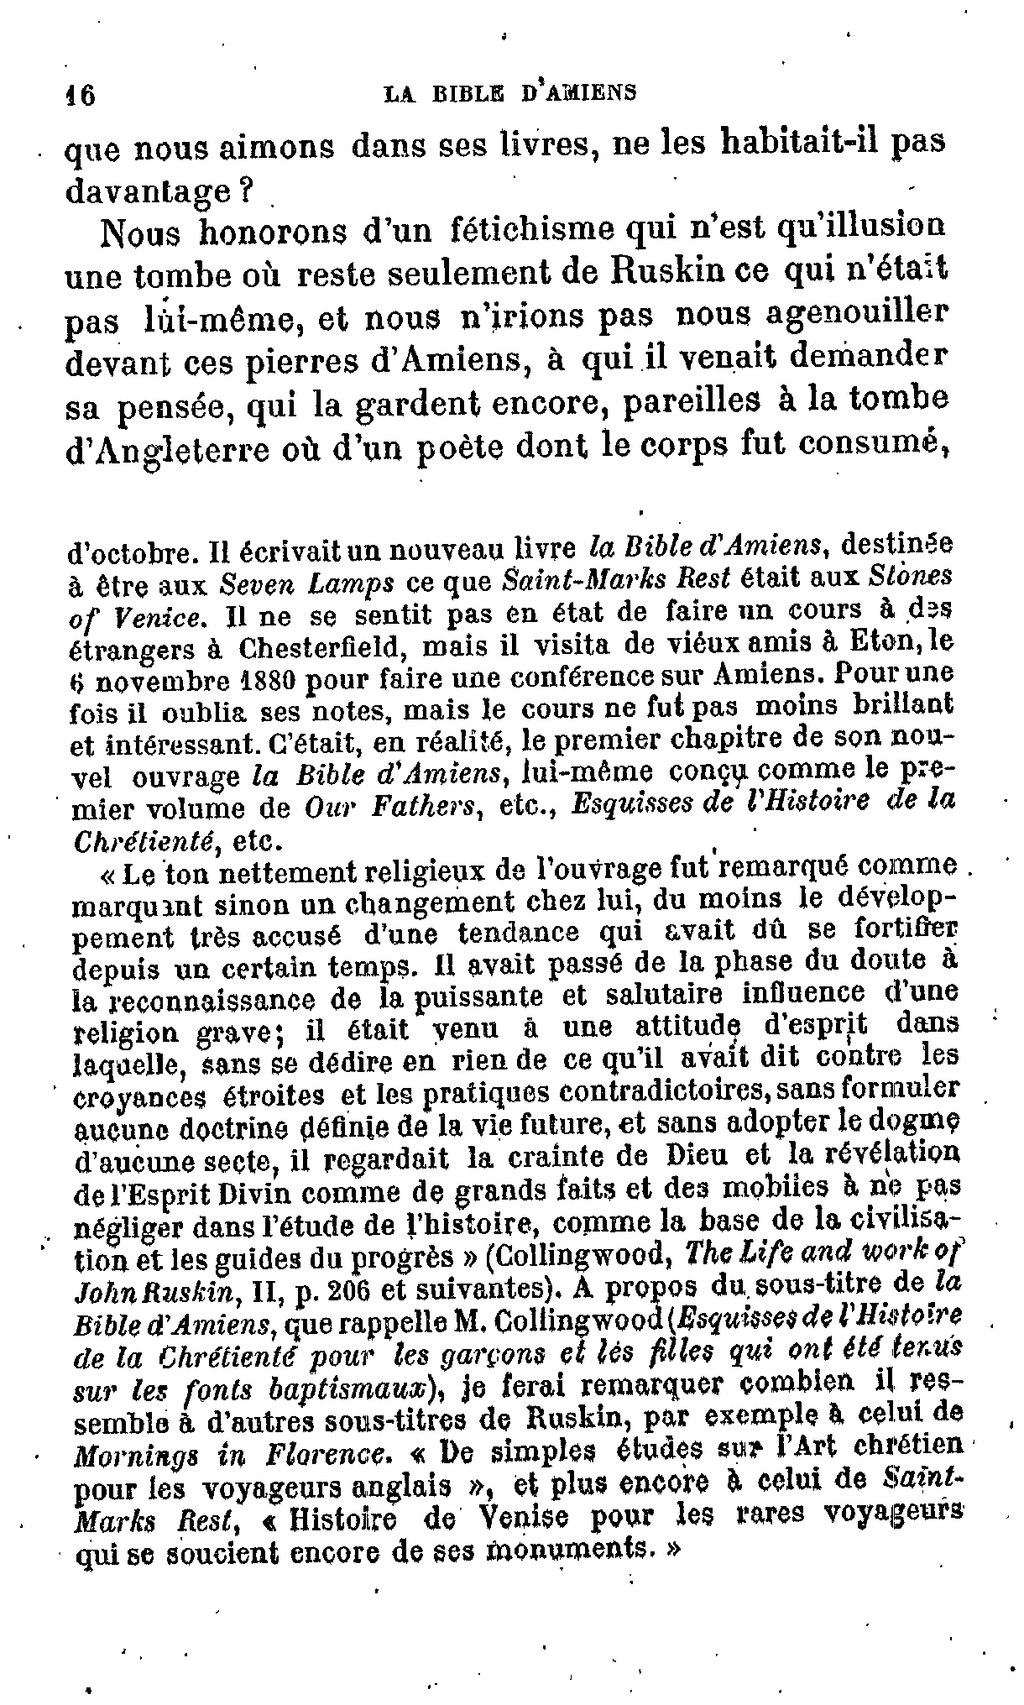 page ruskin - la bible d u2019amiens djvu  16